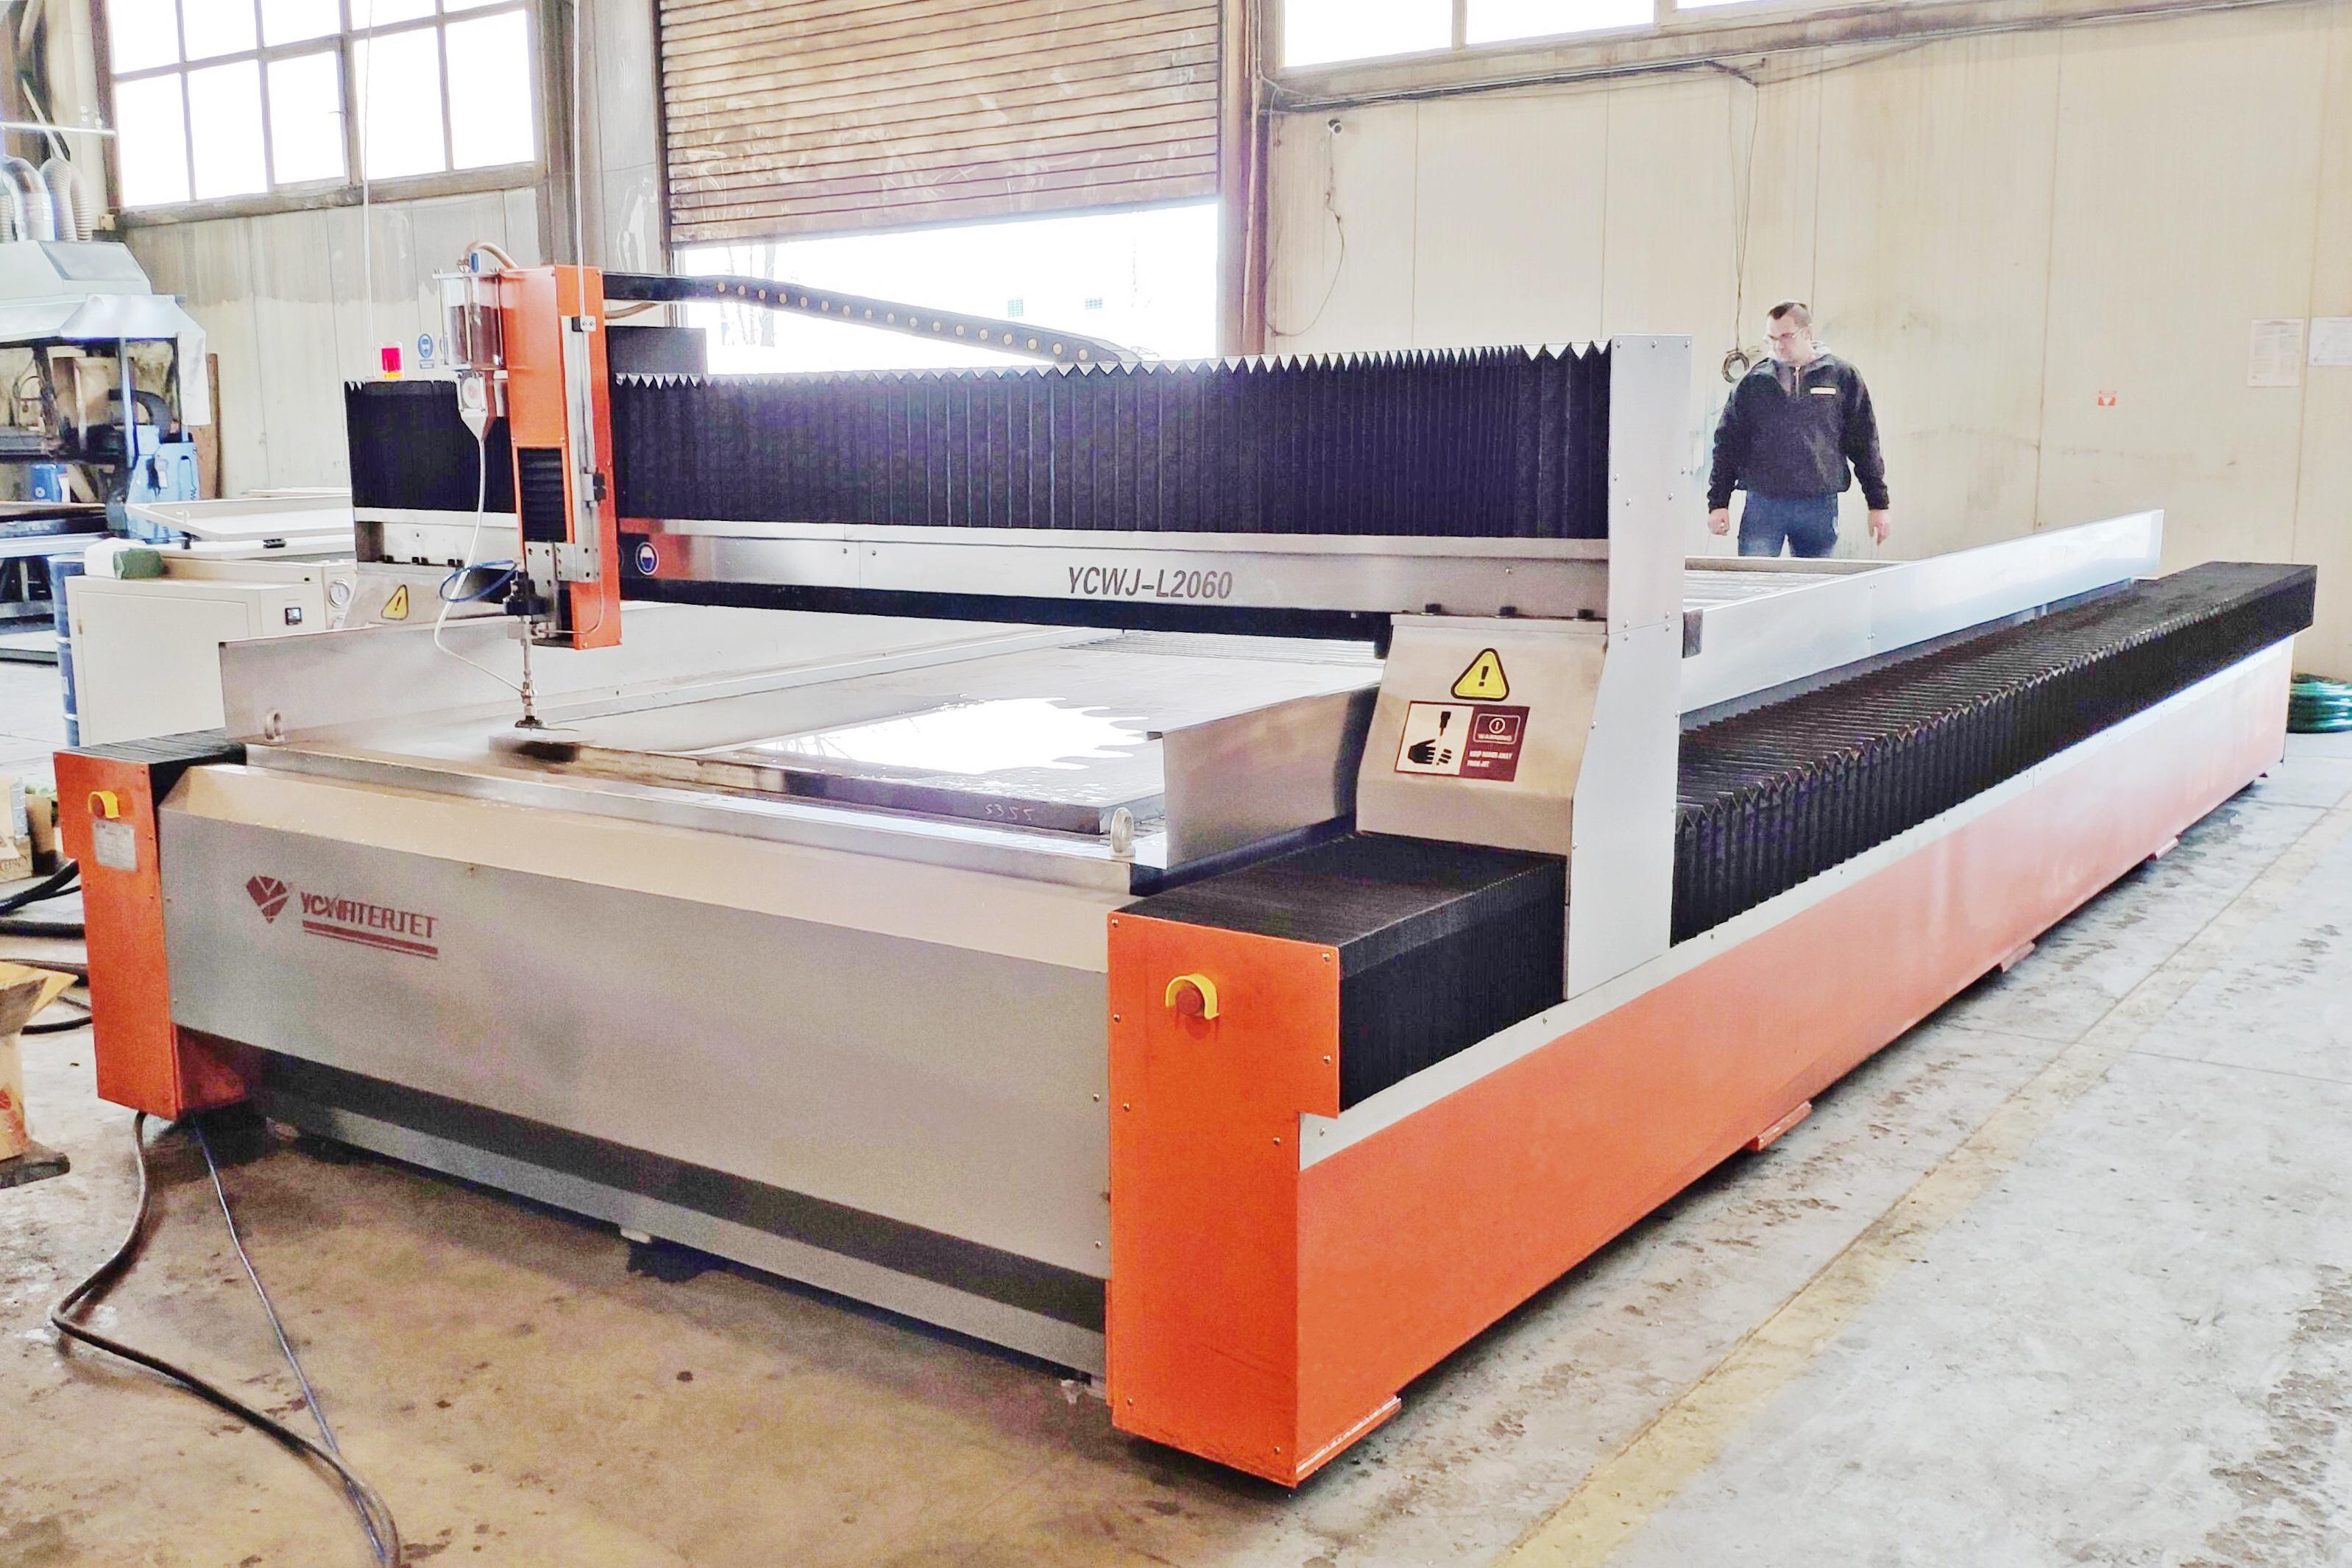 L2060 YC waterjet cutter machine